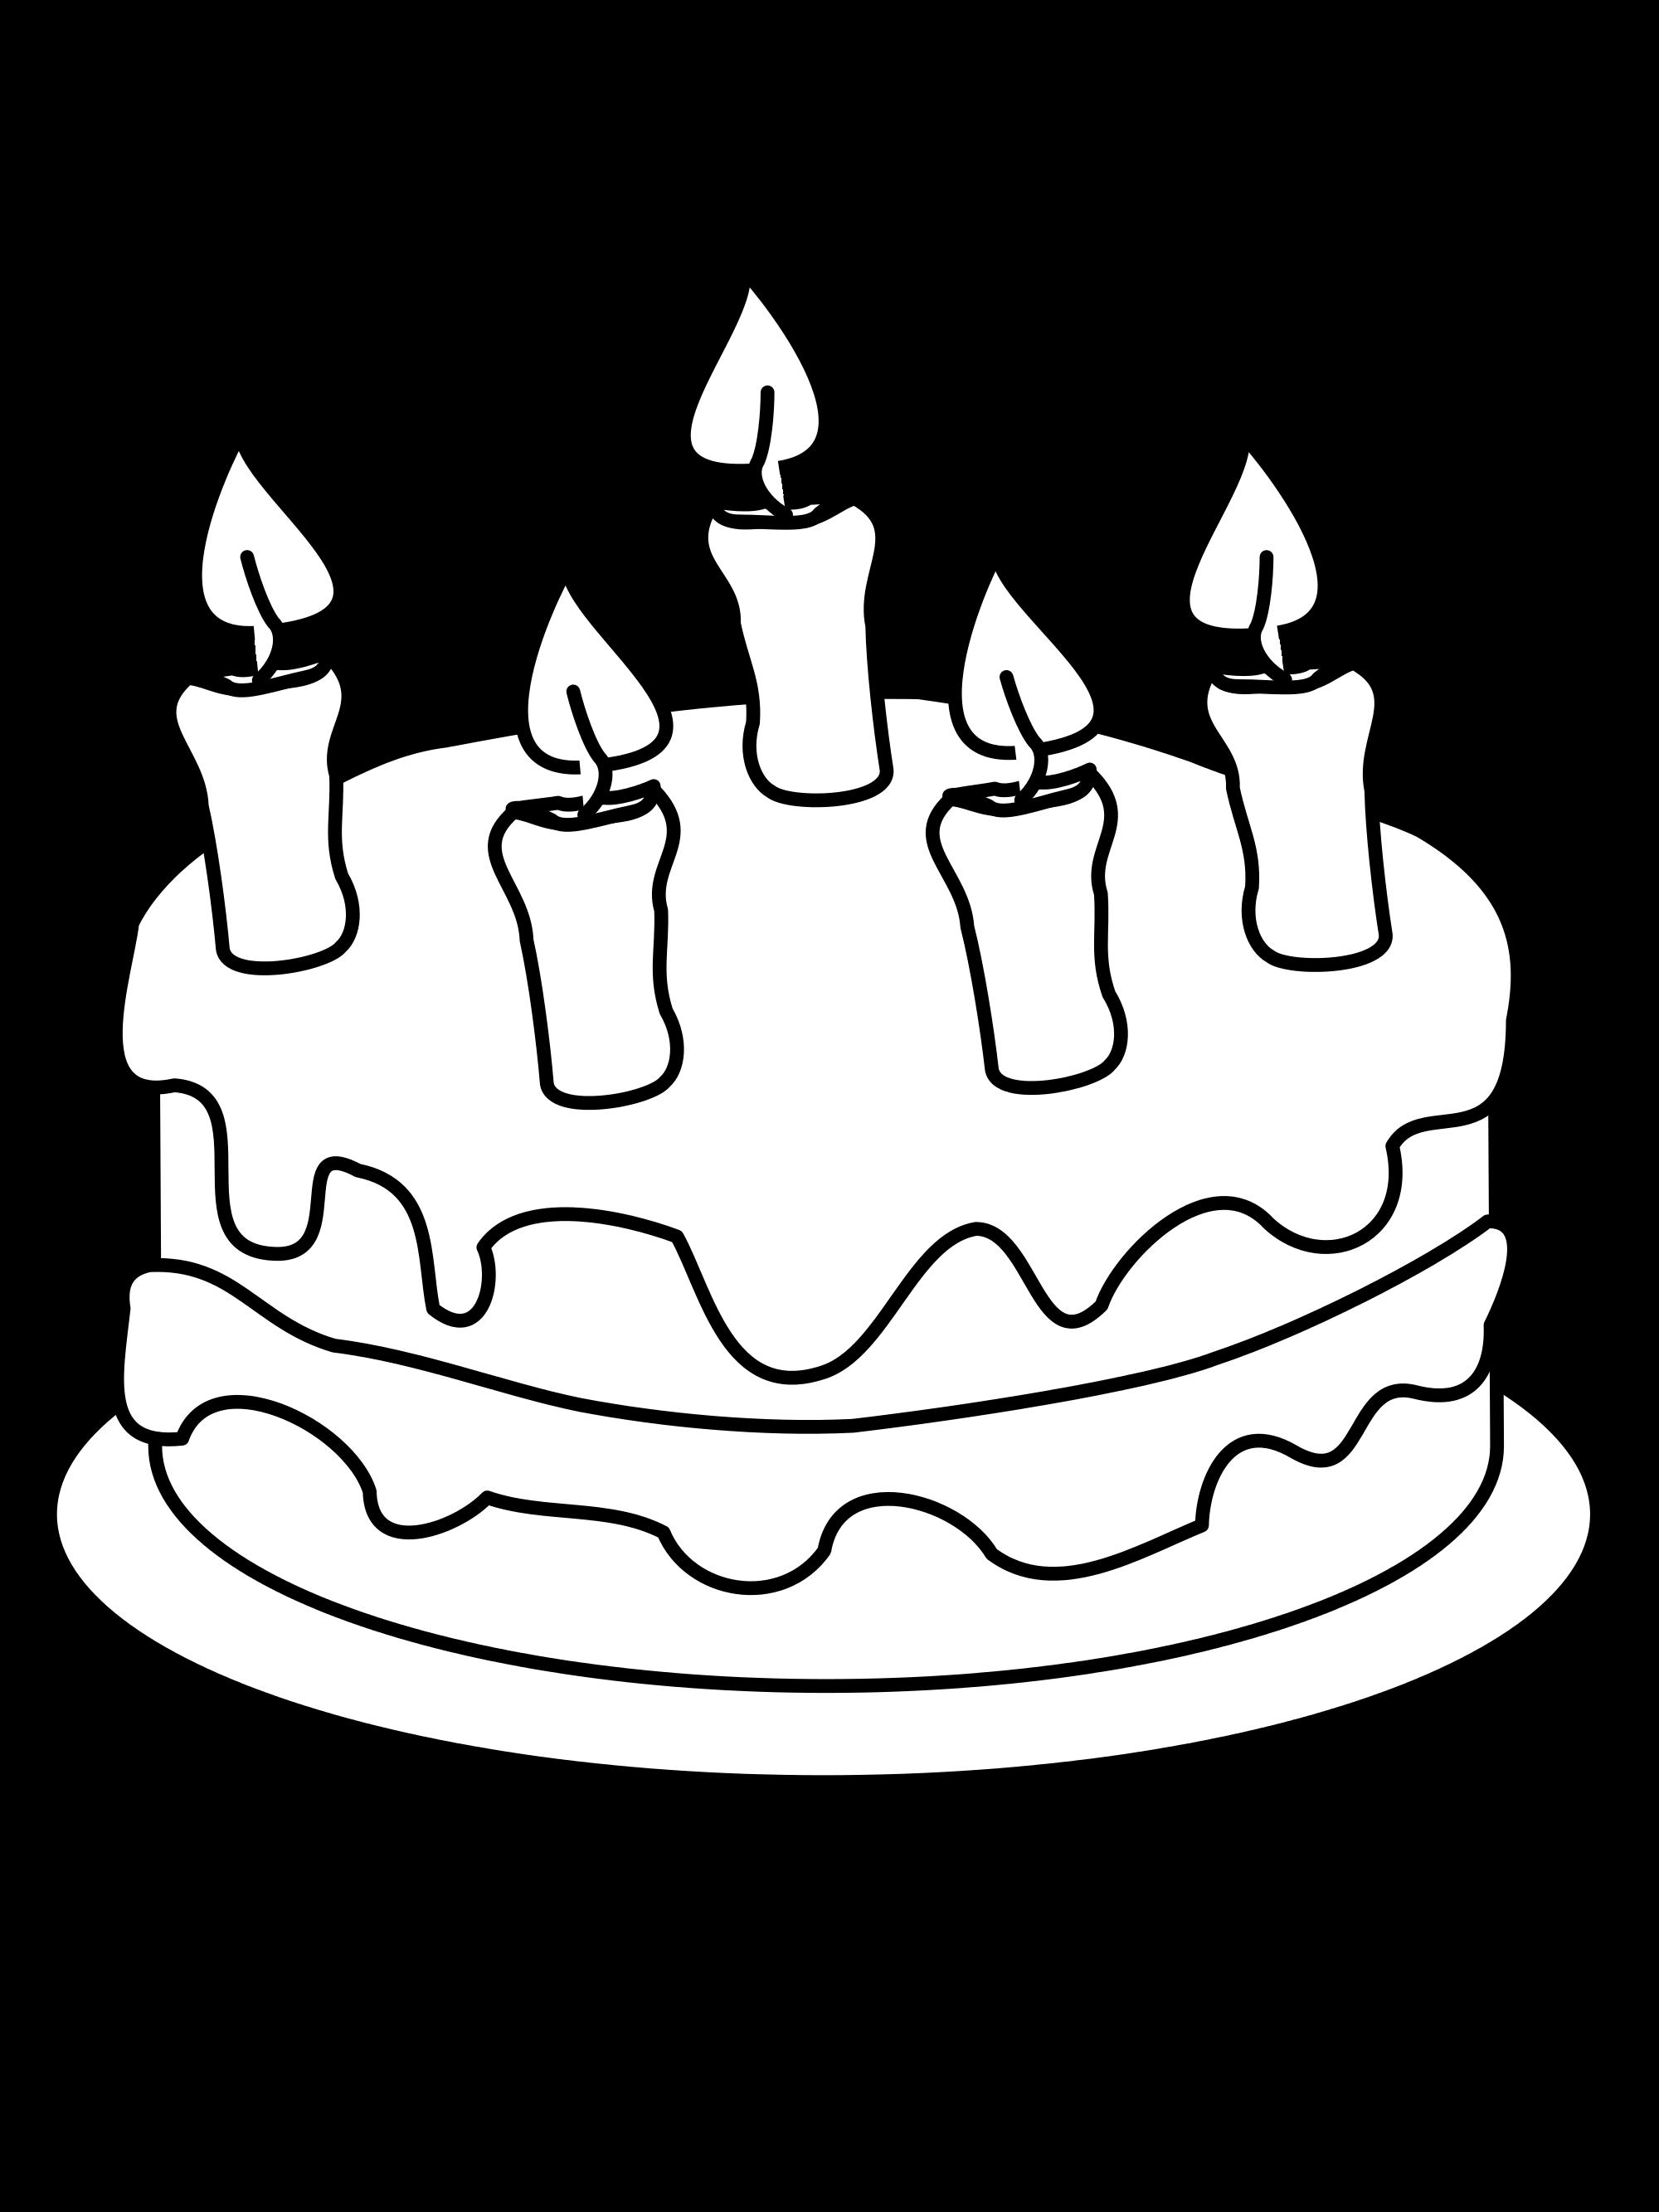 2000x2667 Filedraw This Birthday Cake.svg